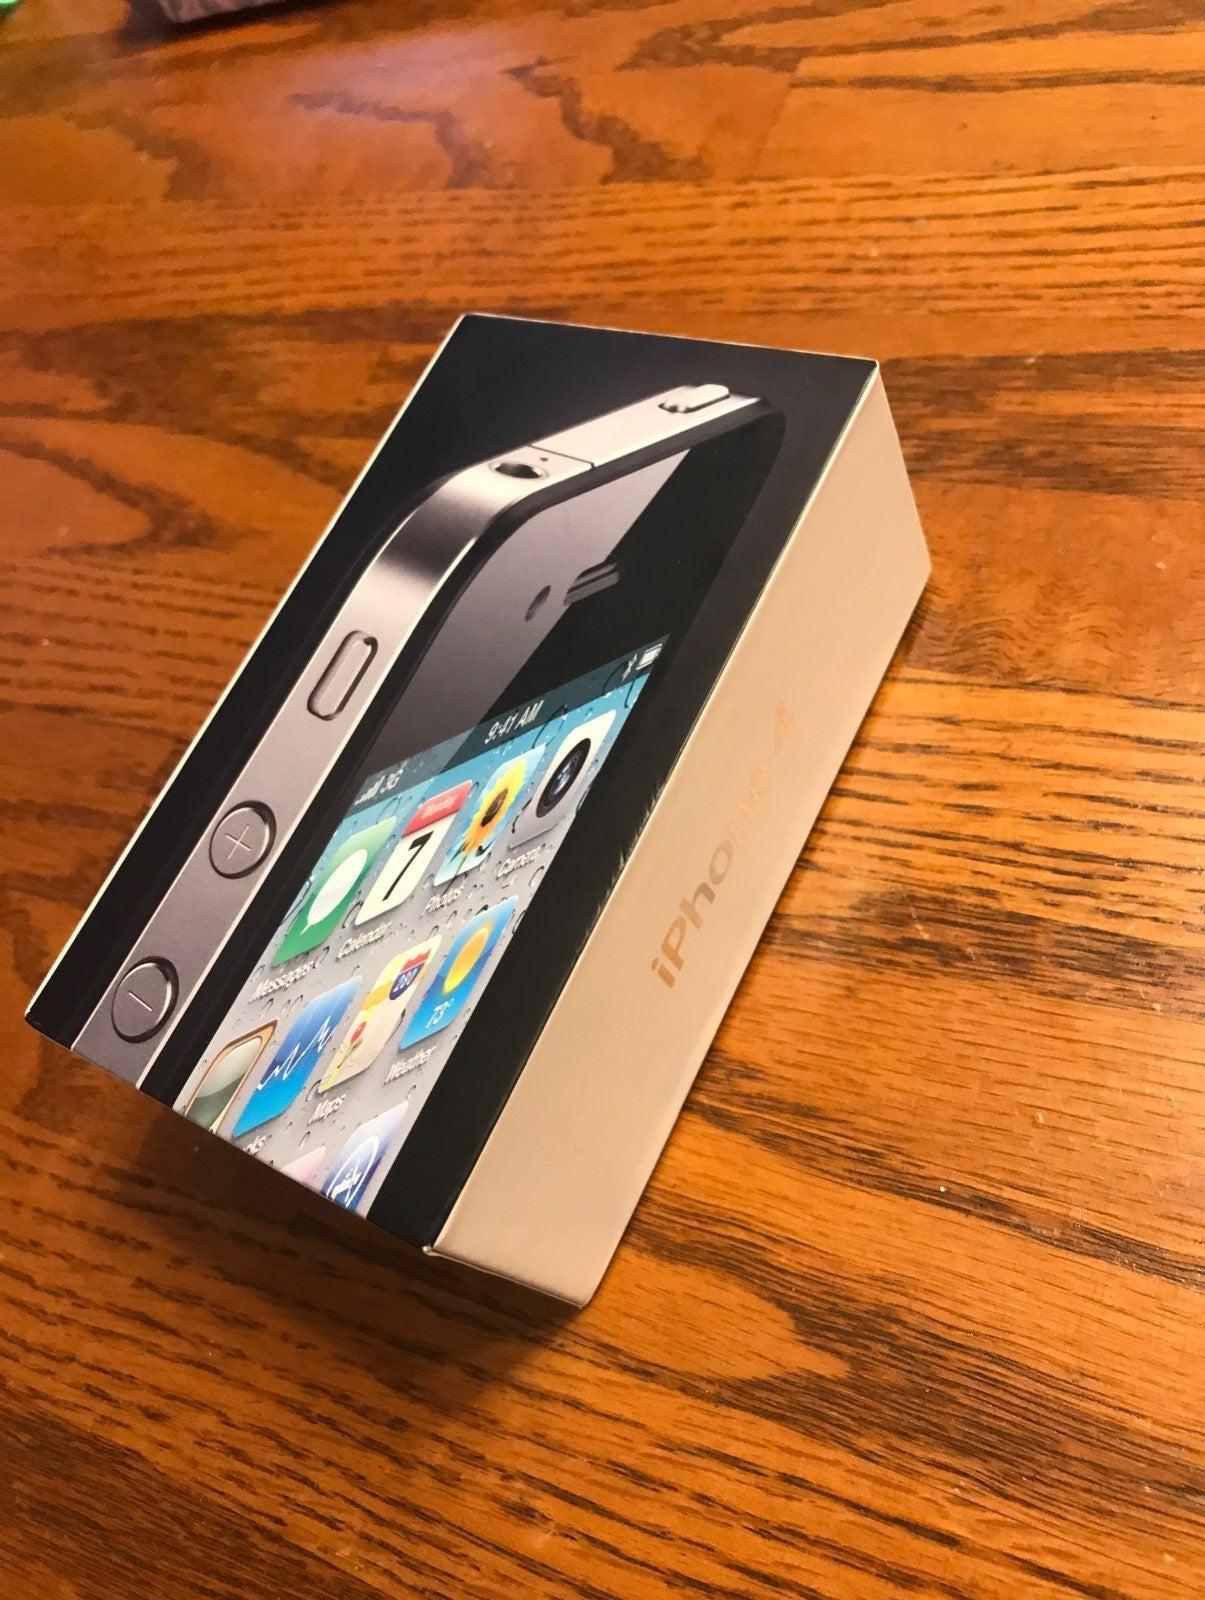 iPhone 4 Black 8 GB Unlocked